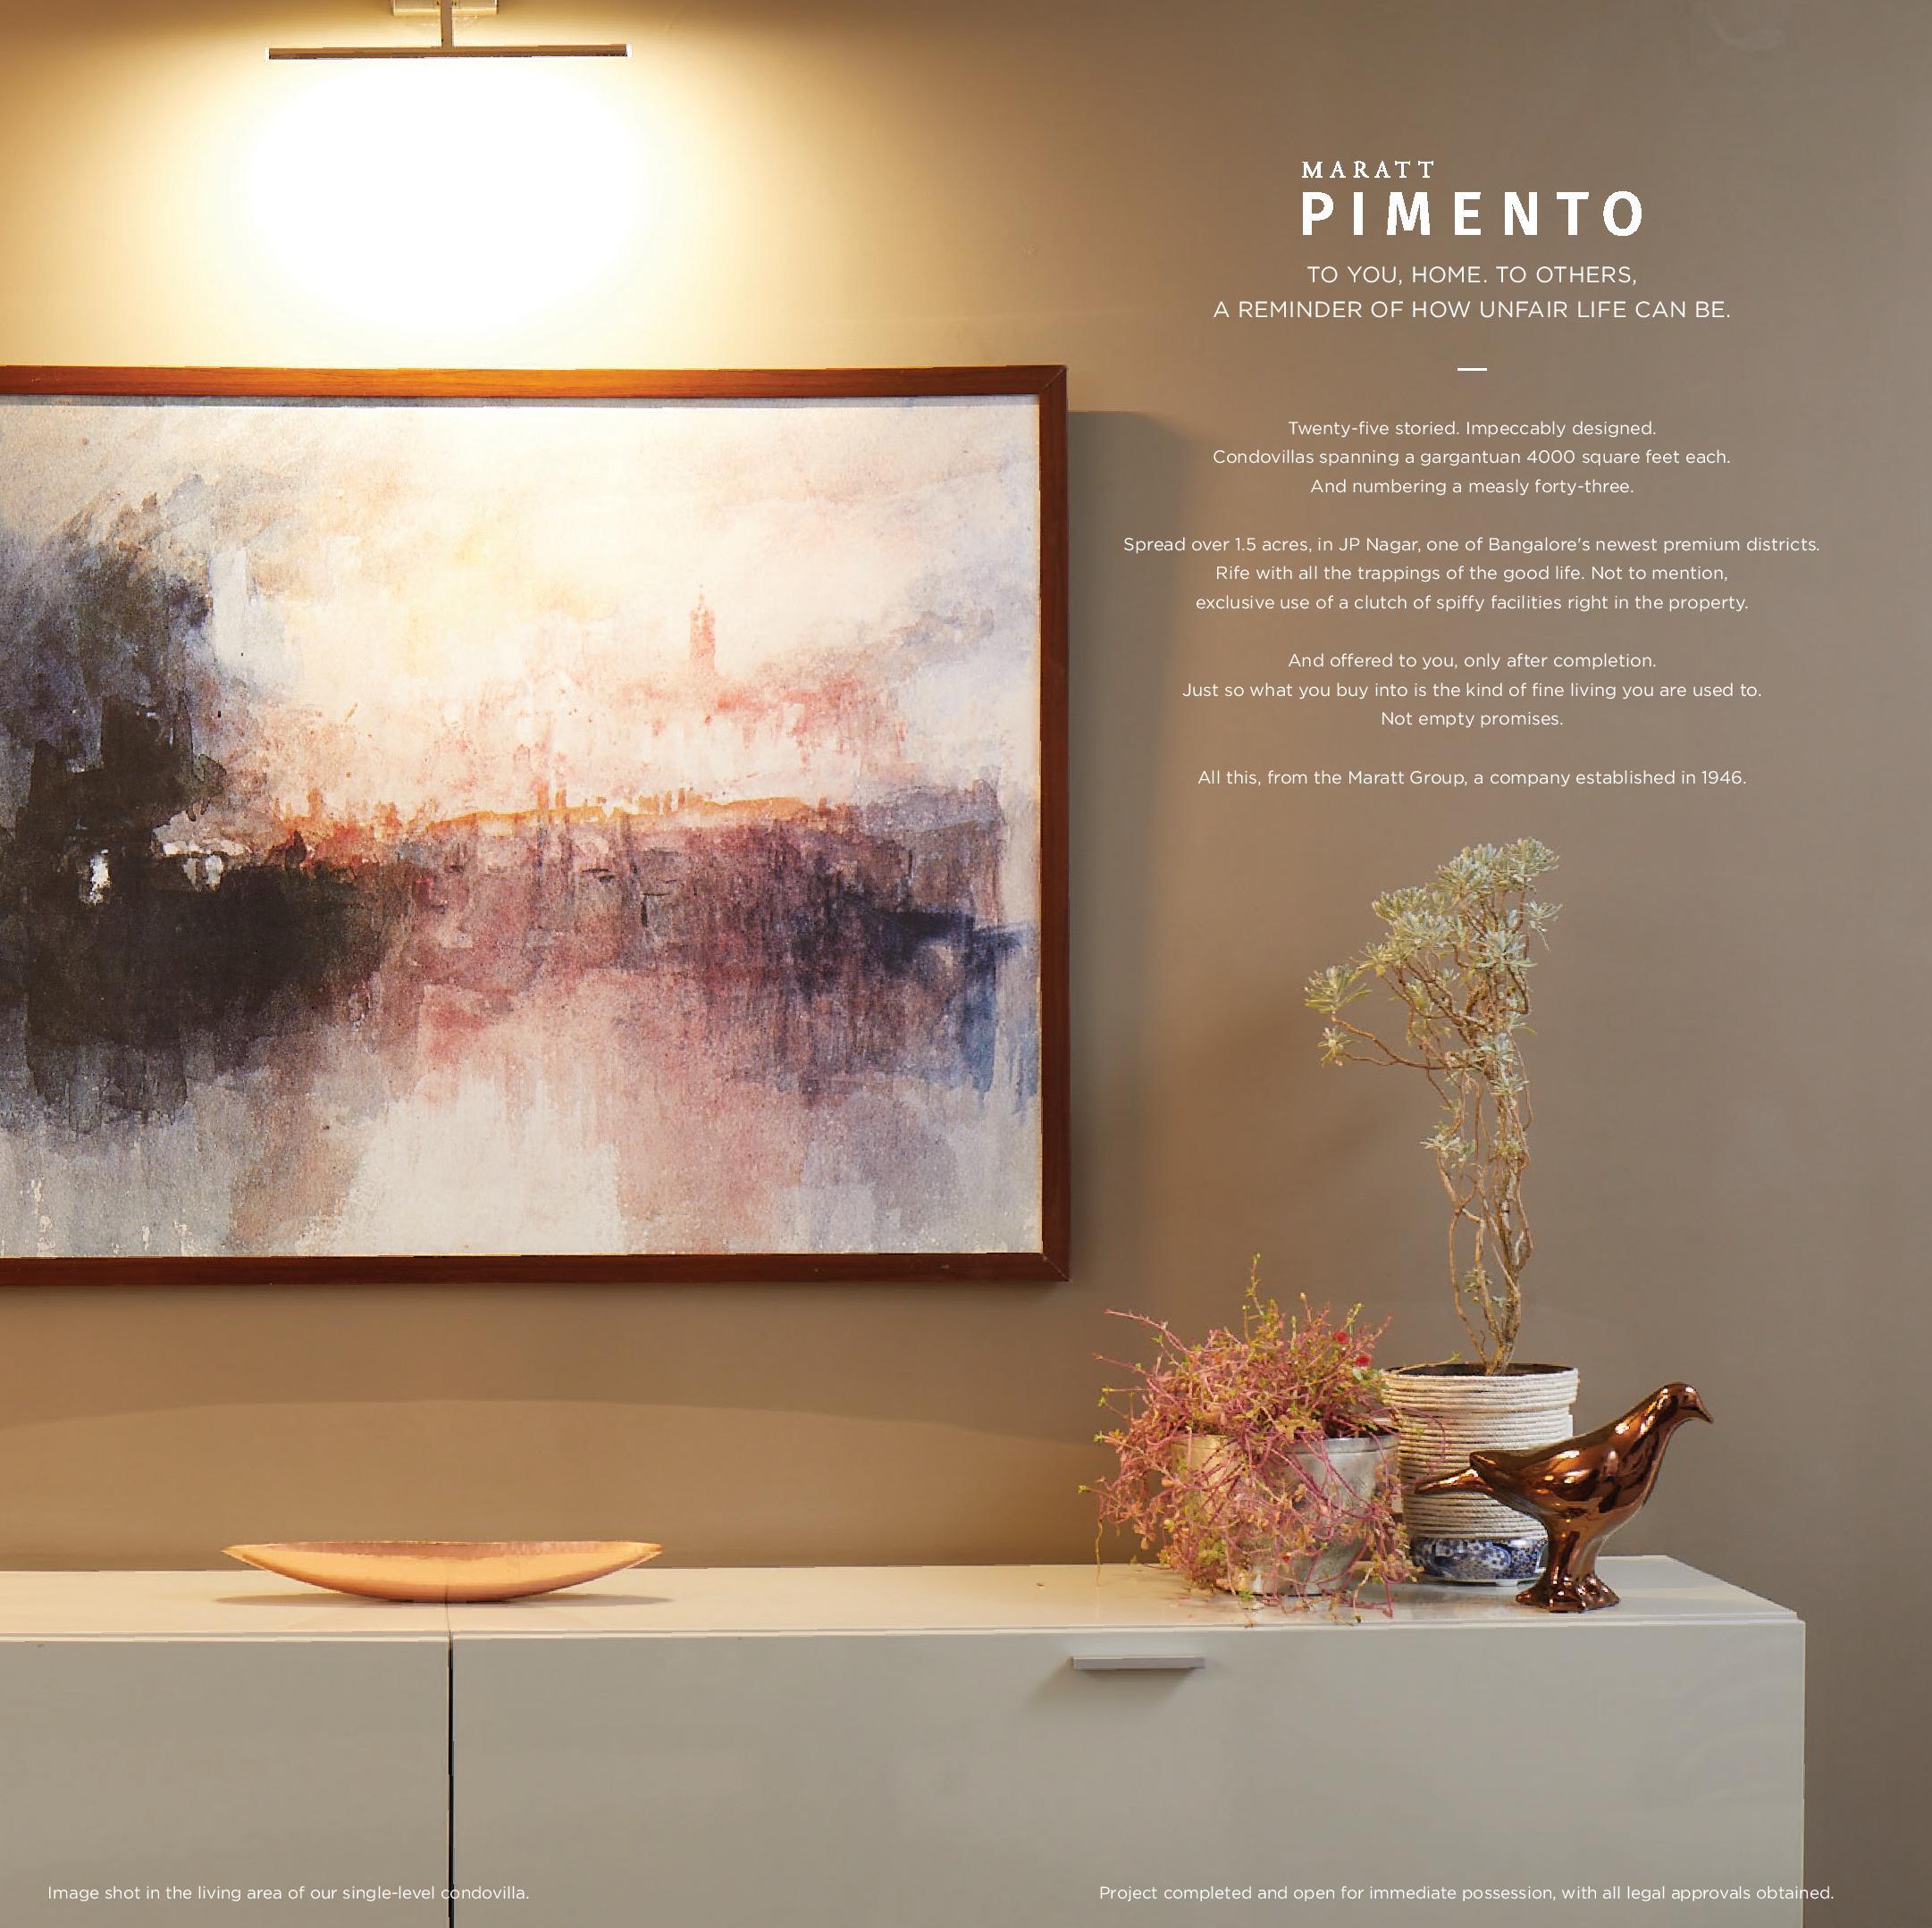 maratt_pimento_gallery (2)